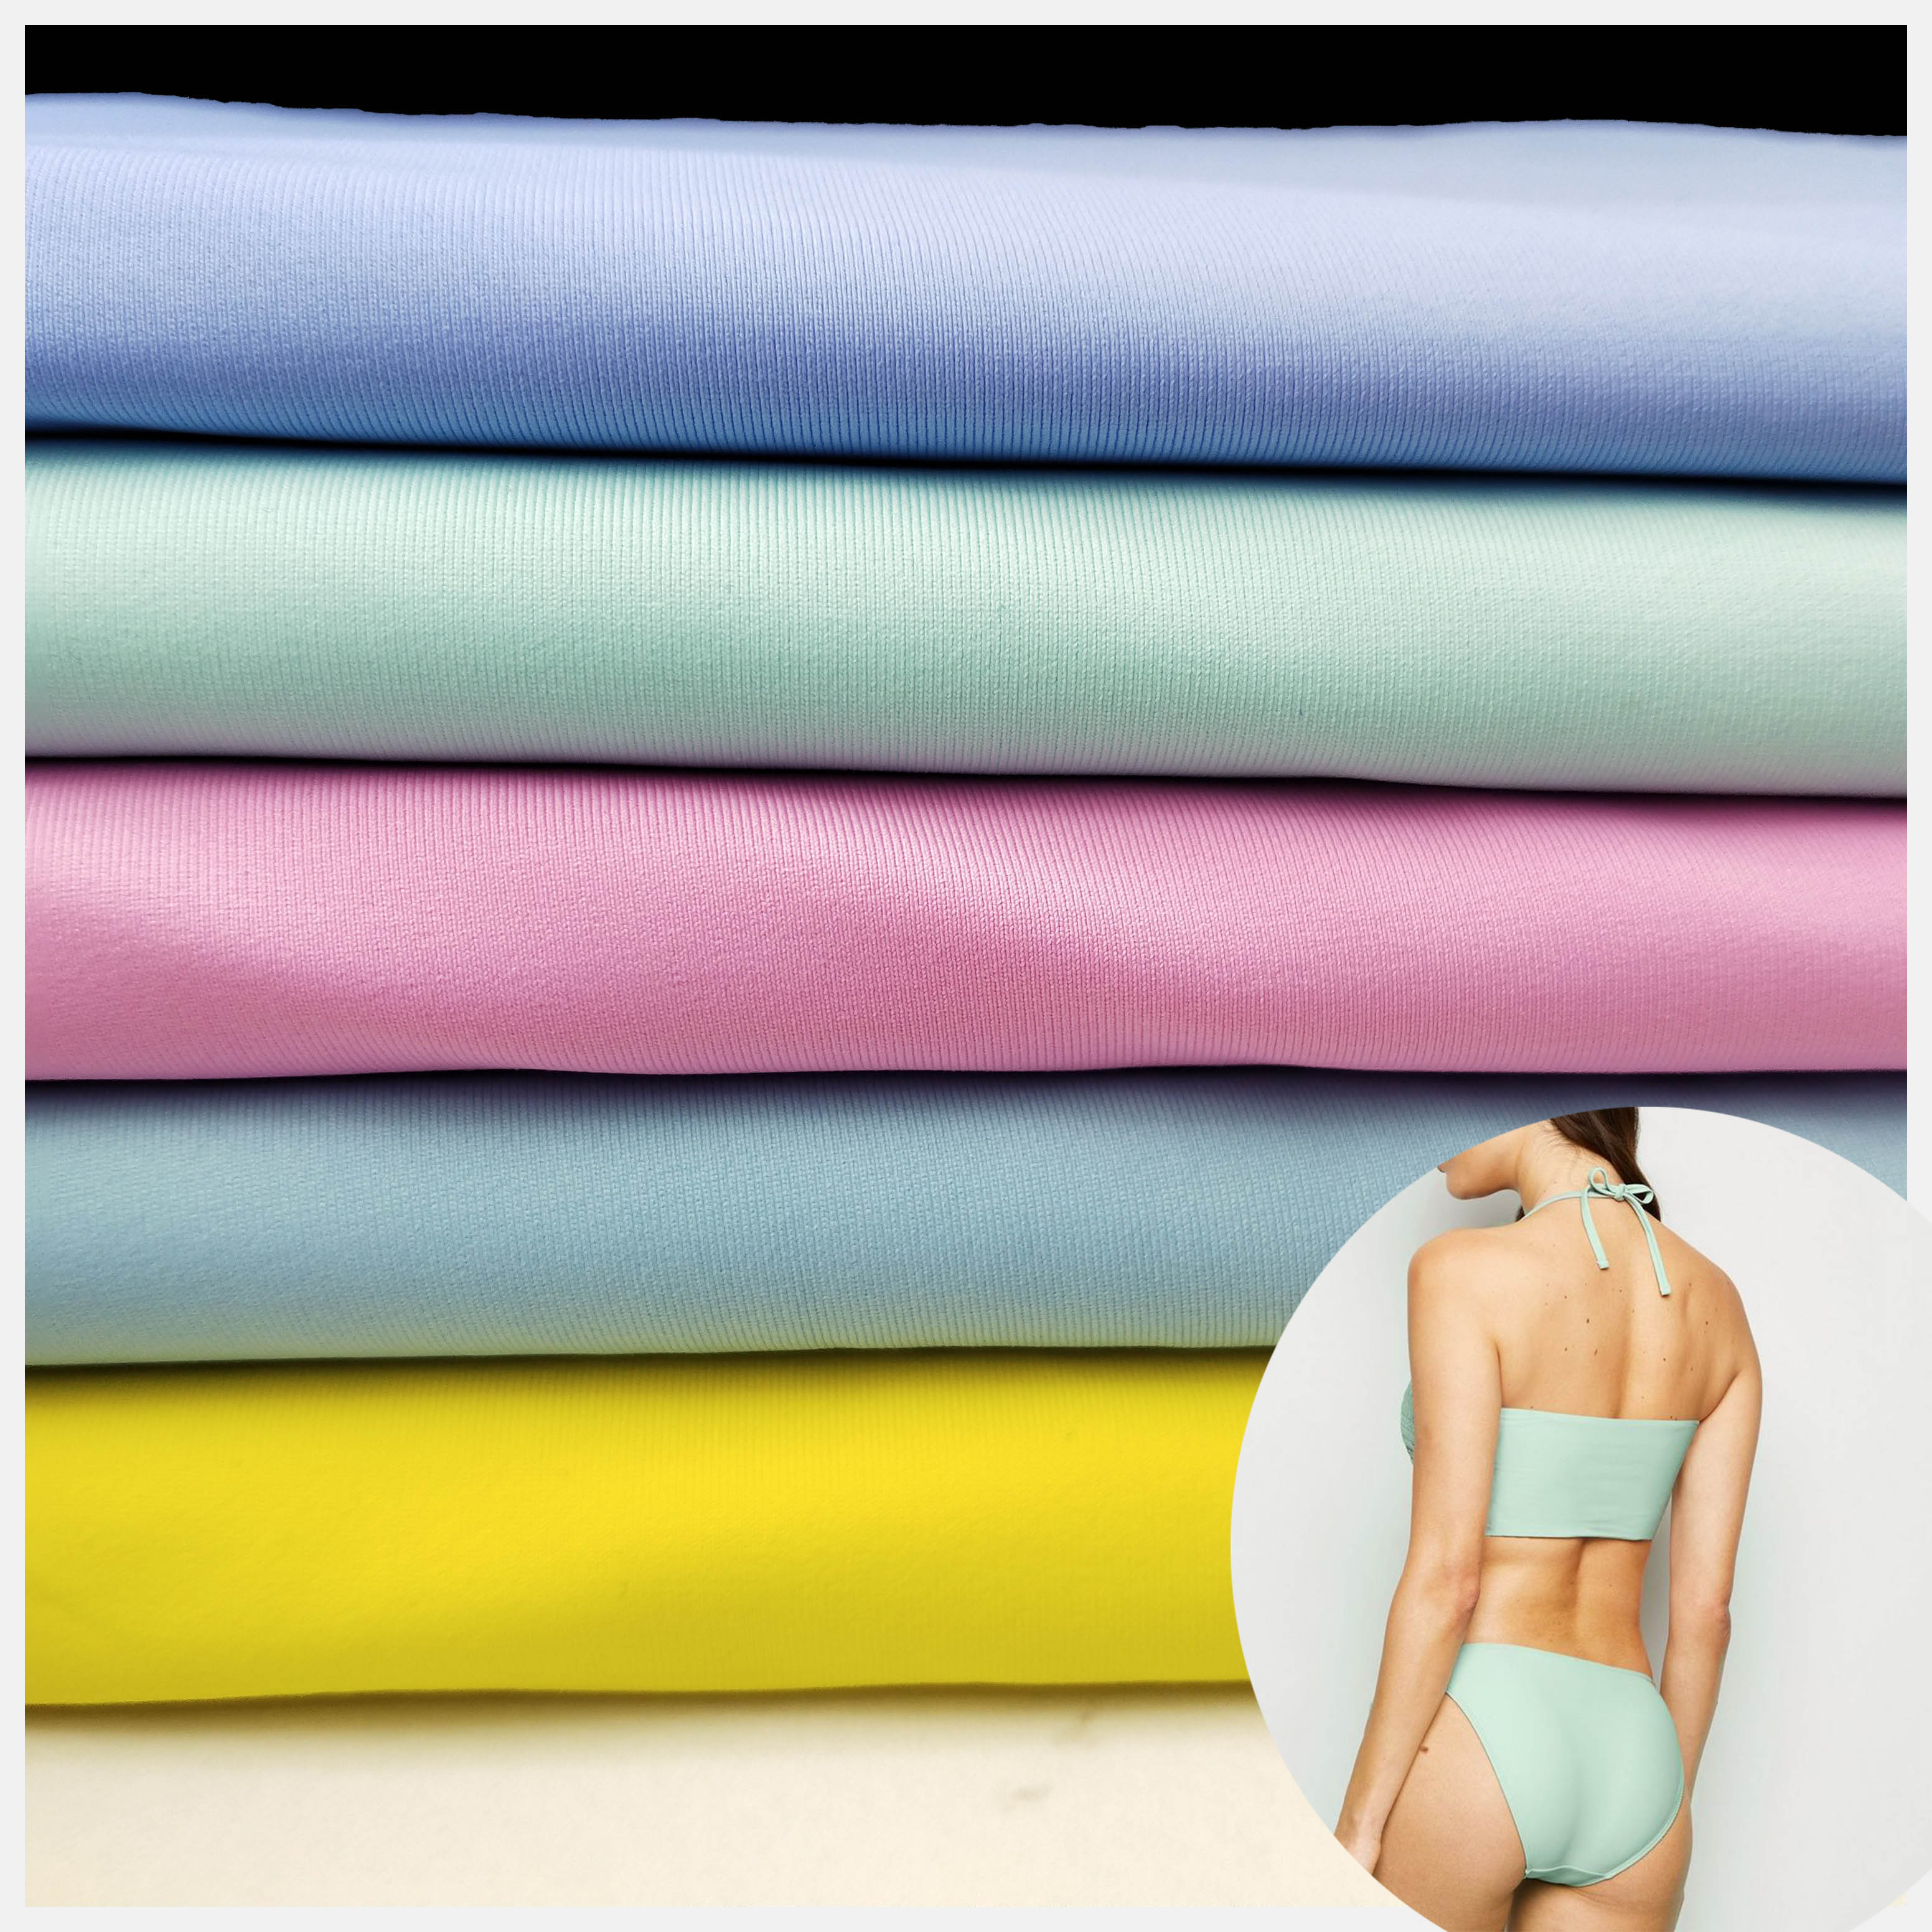 four way tretch bikini fabric,1 Yard, Customer's request